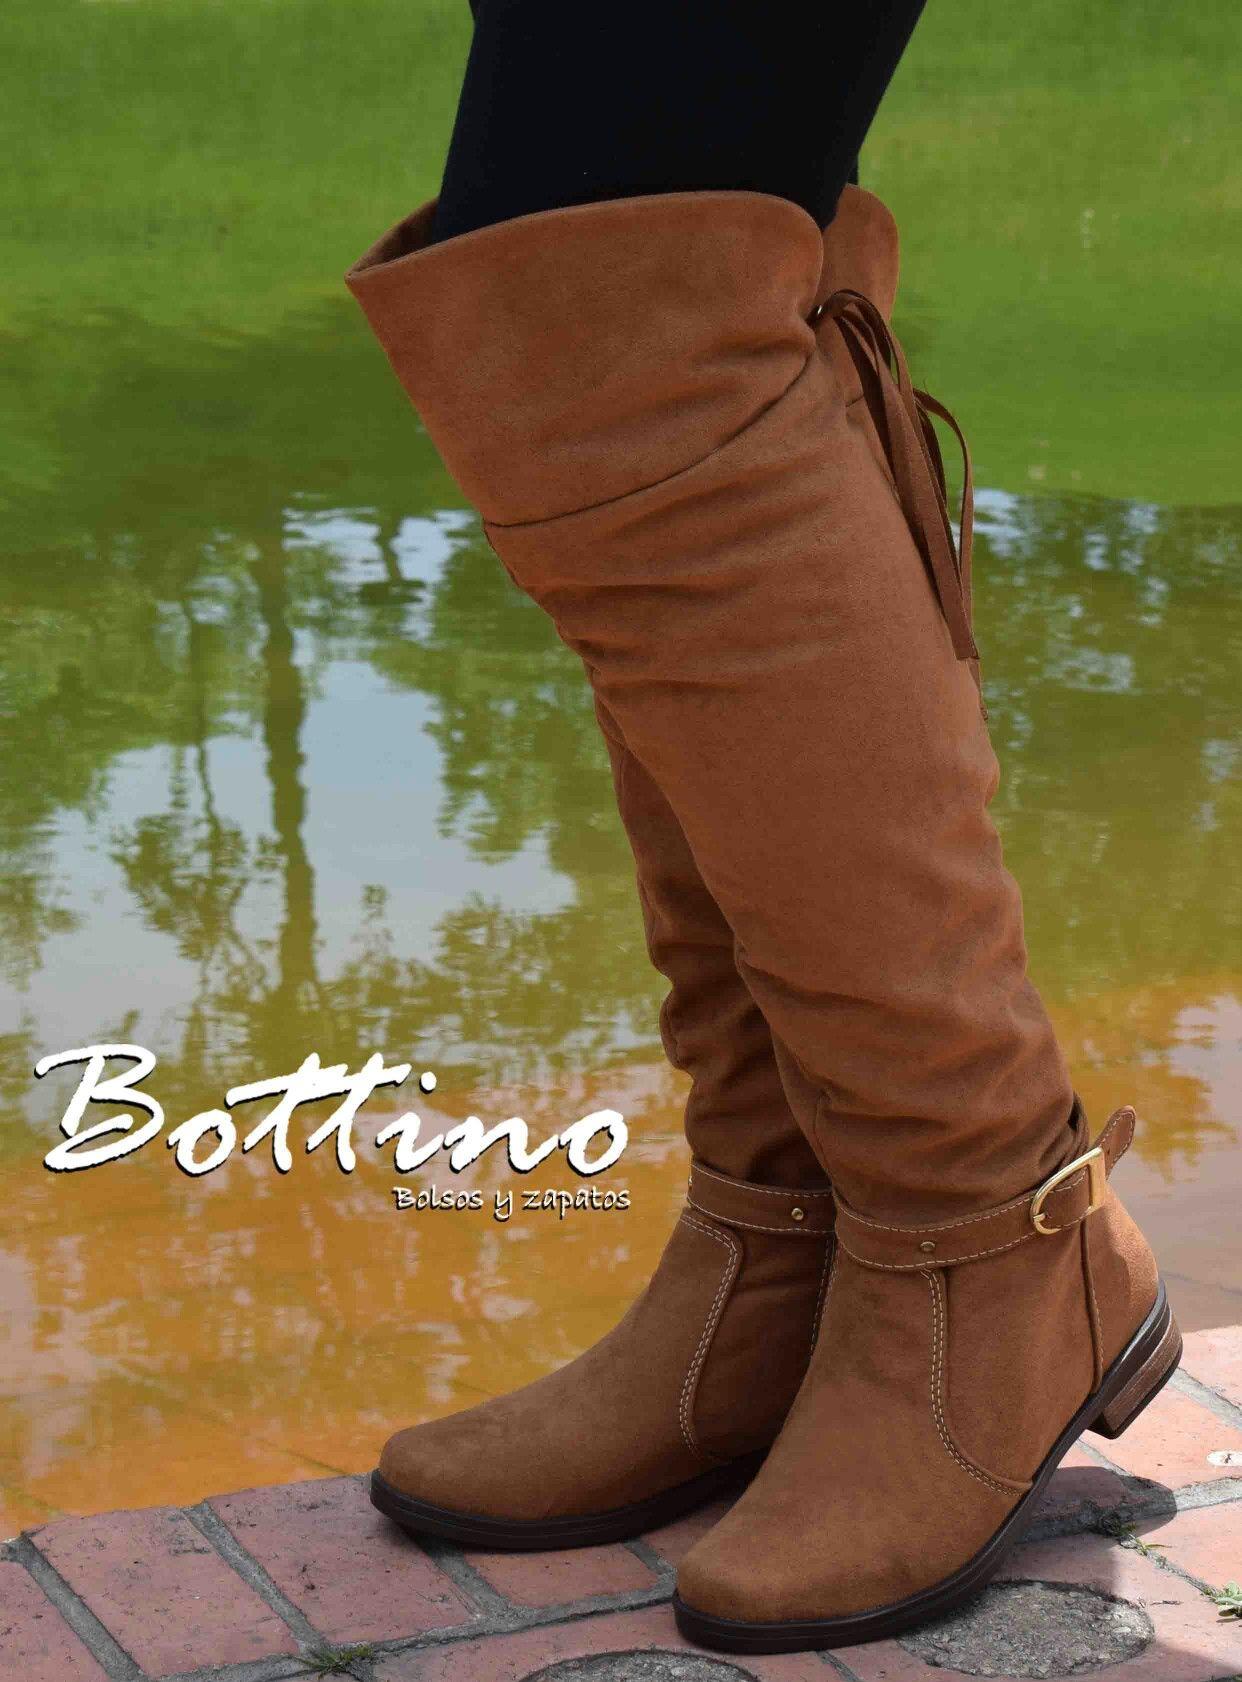 ¡Para las mujeres que tanto quieres! Botas extra largas www.bottino.com.co  botas  botas  mujer  líneafemenina  zapatos  compracolombiano  YoUsoBottino    ... e4b6a7323bc77